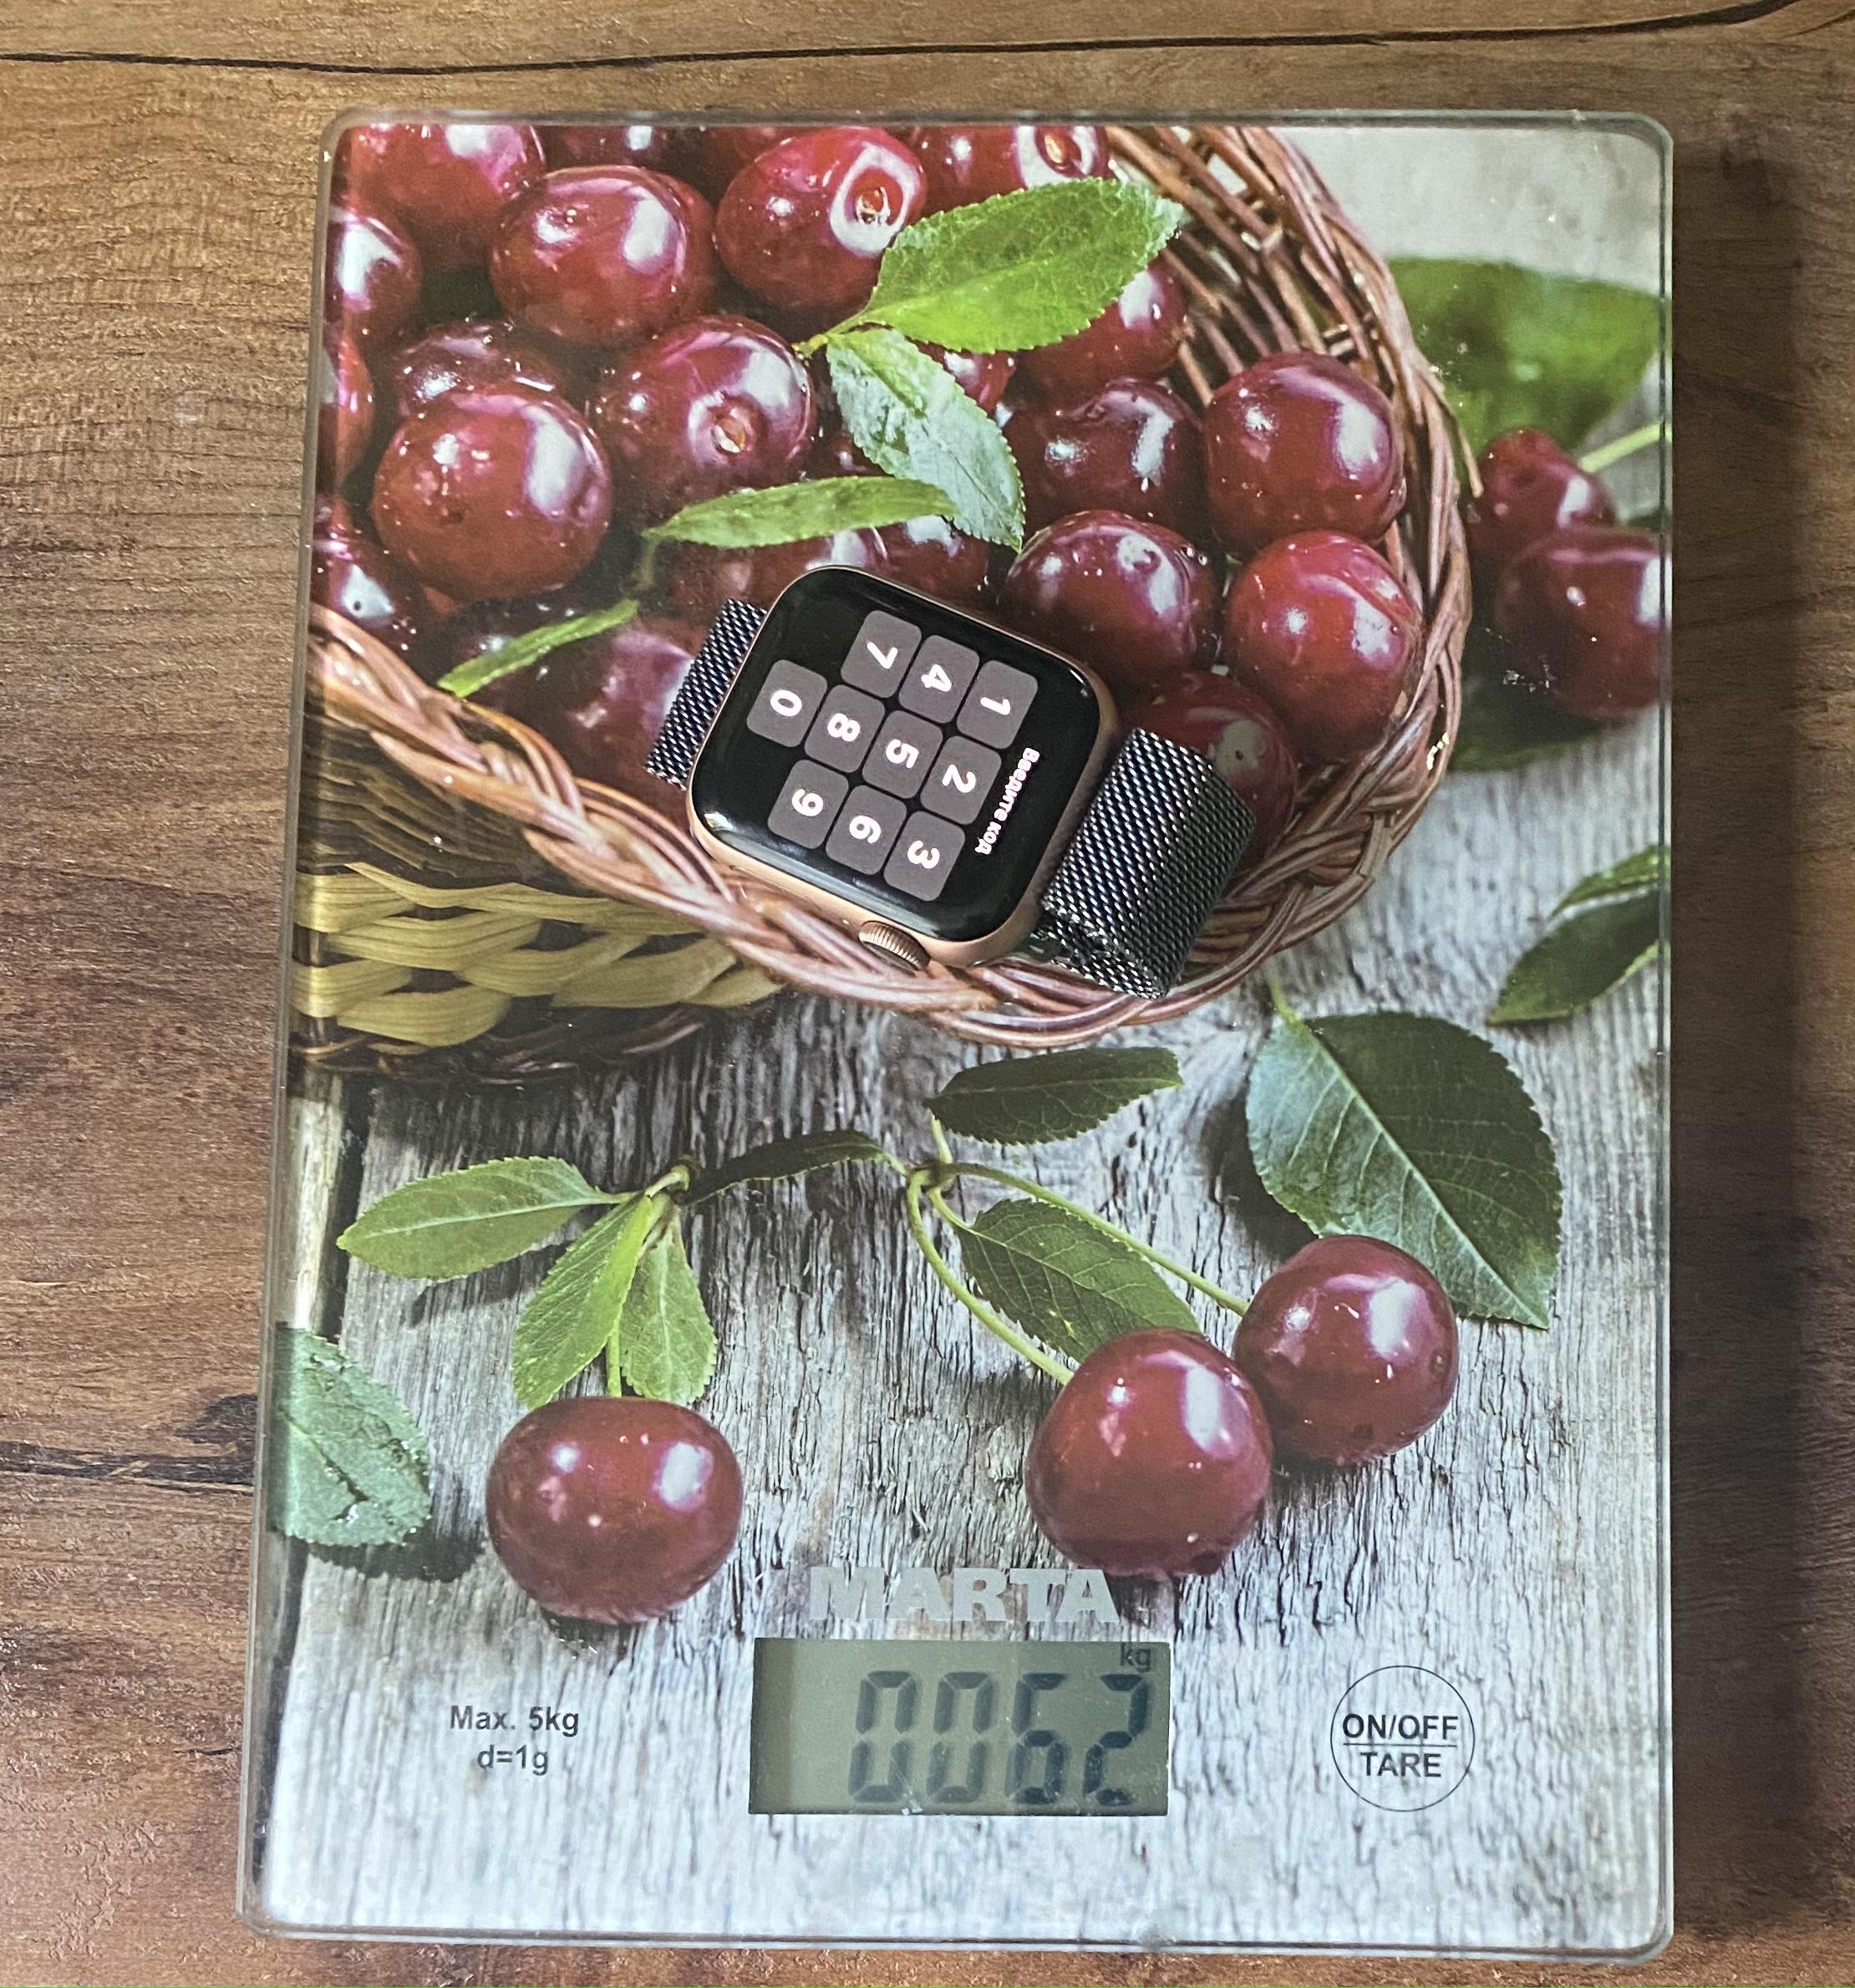 вес apple watch серии 4 40 мм на металлическом браслете